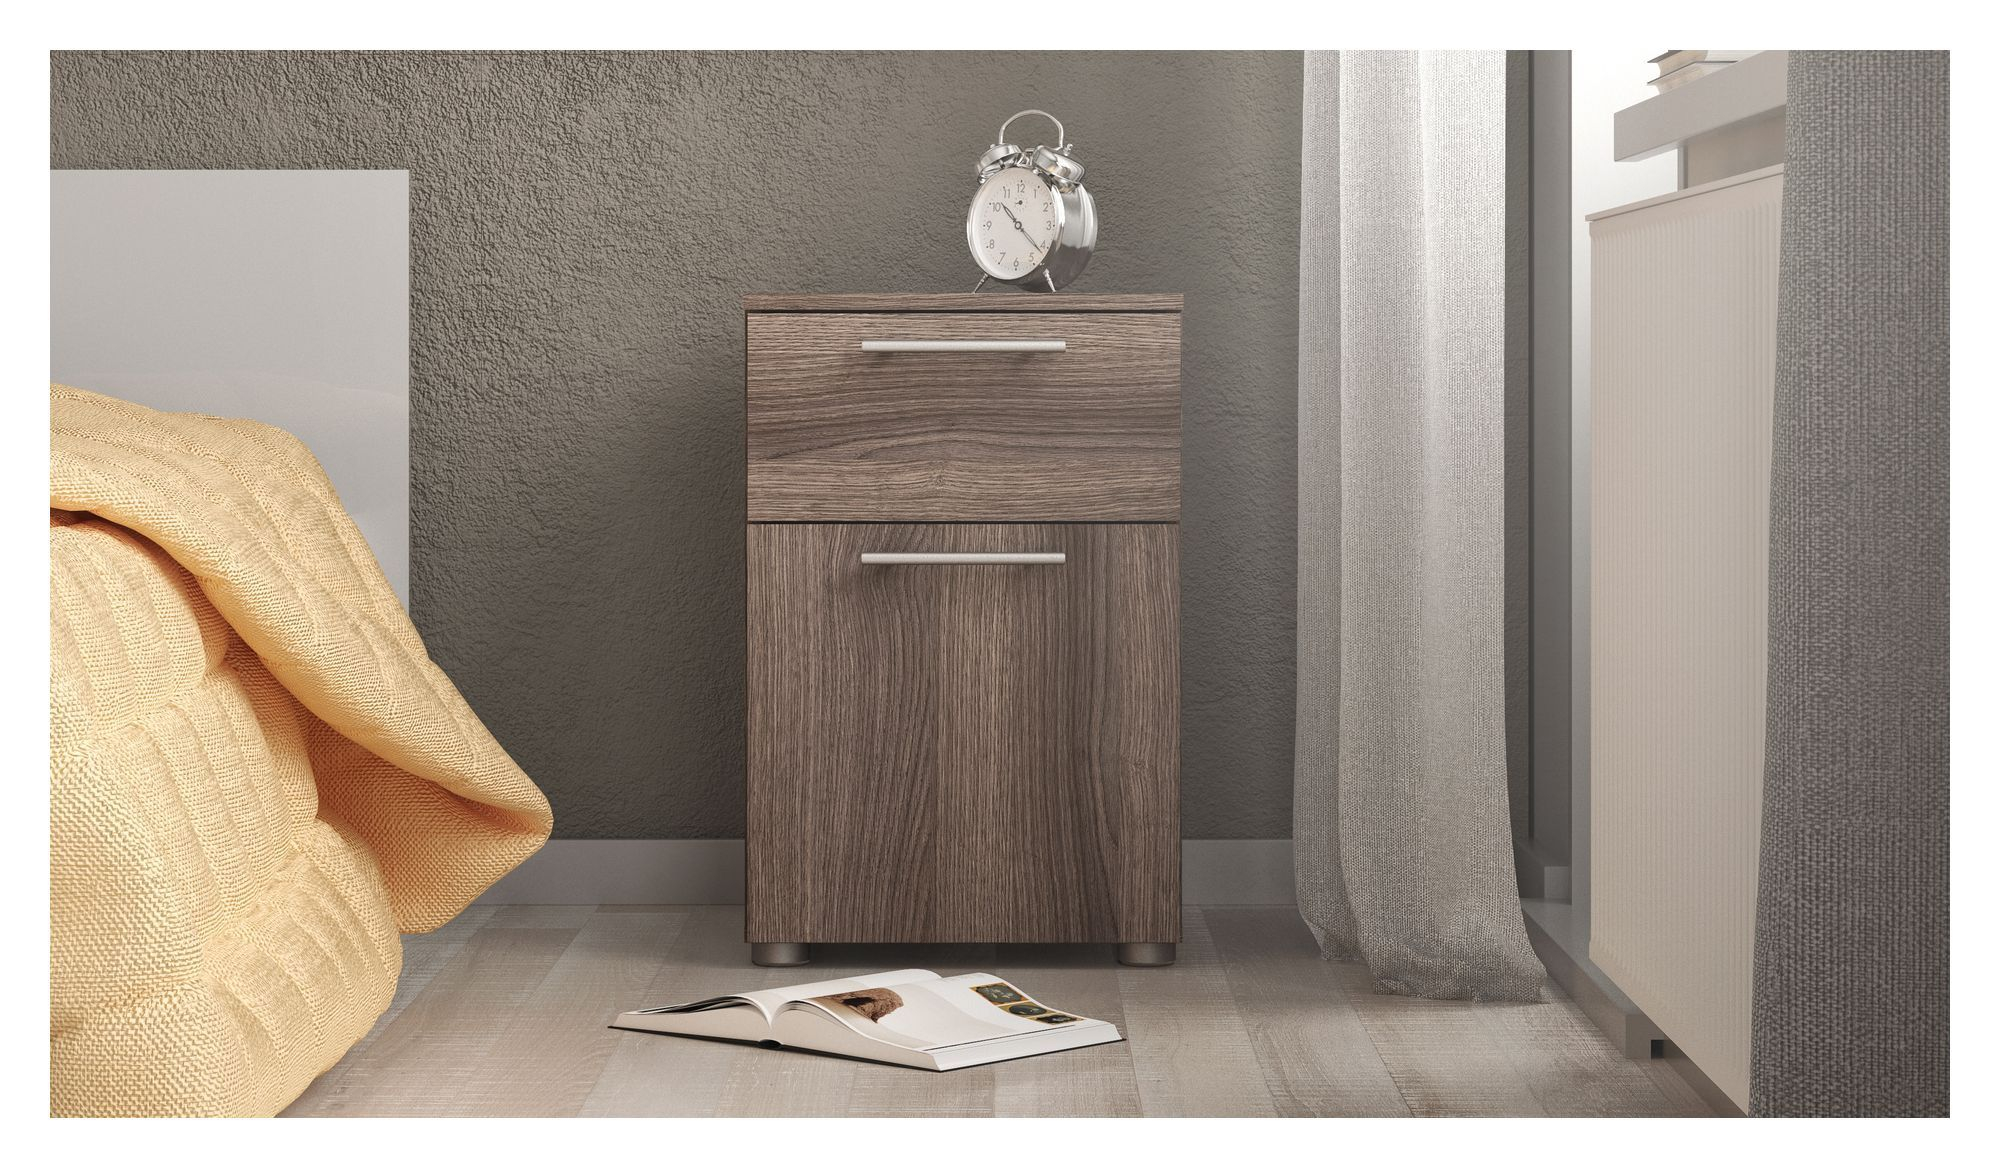 Style Sengebord - Grå - Antracitgrå sengebord